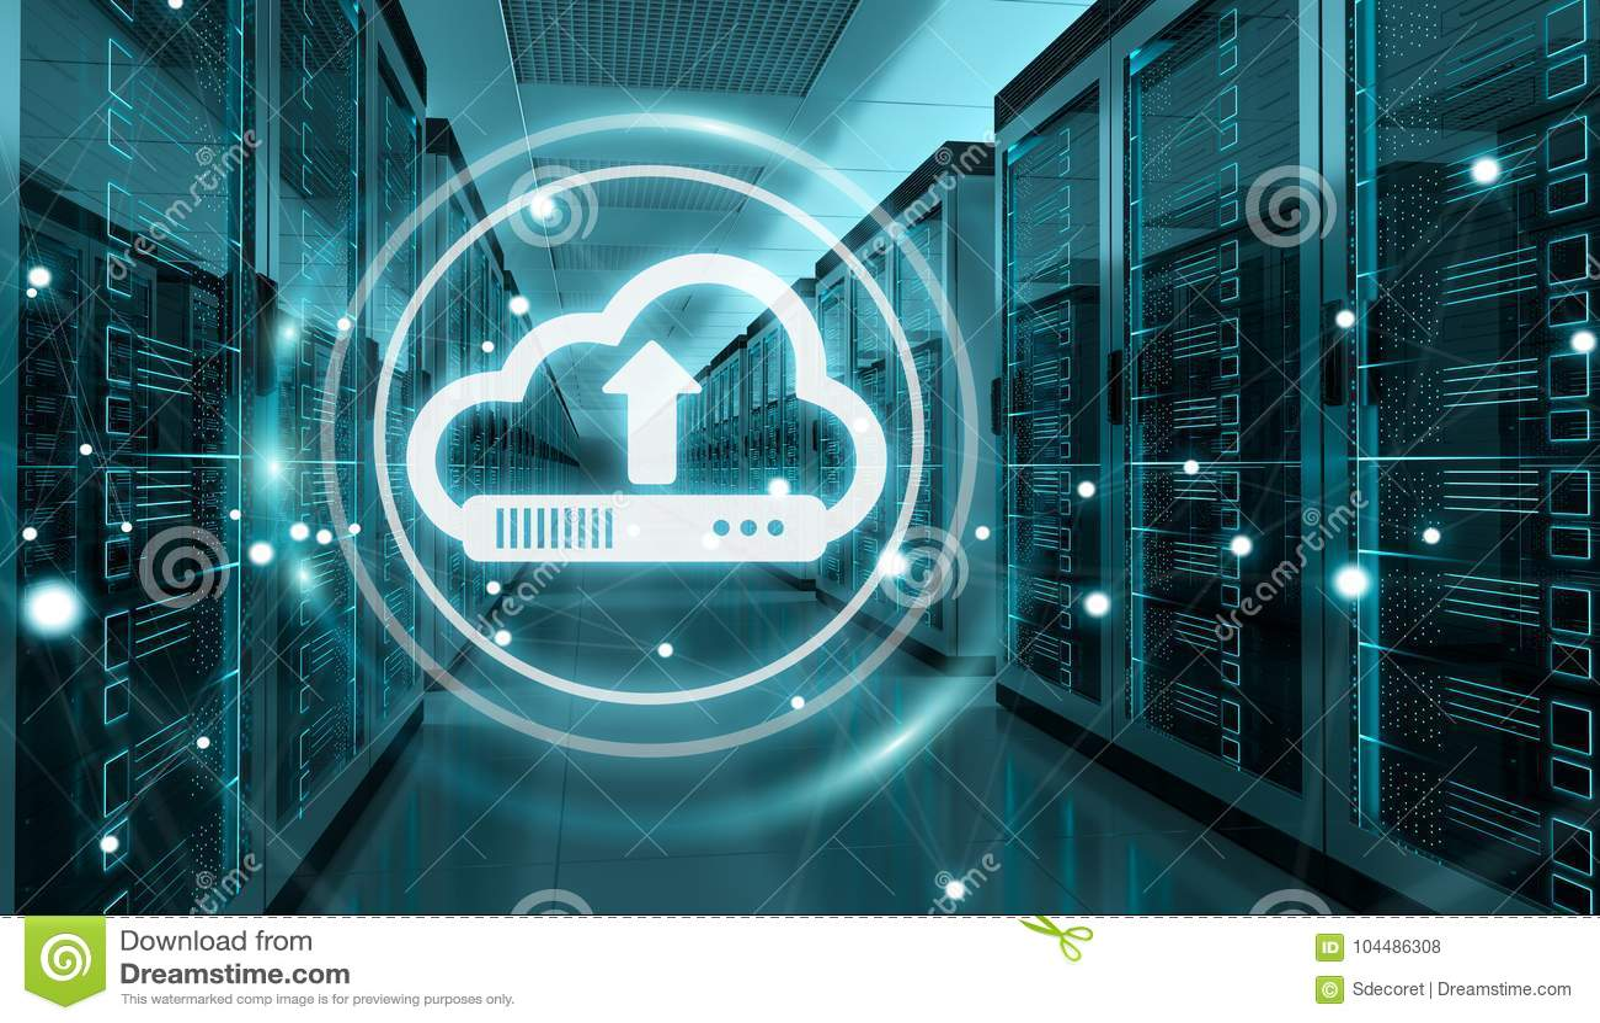 Cloud icon downloading datas in server room center 3D rendering